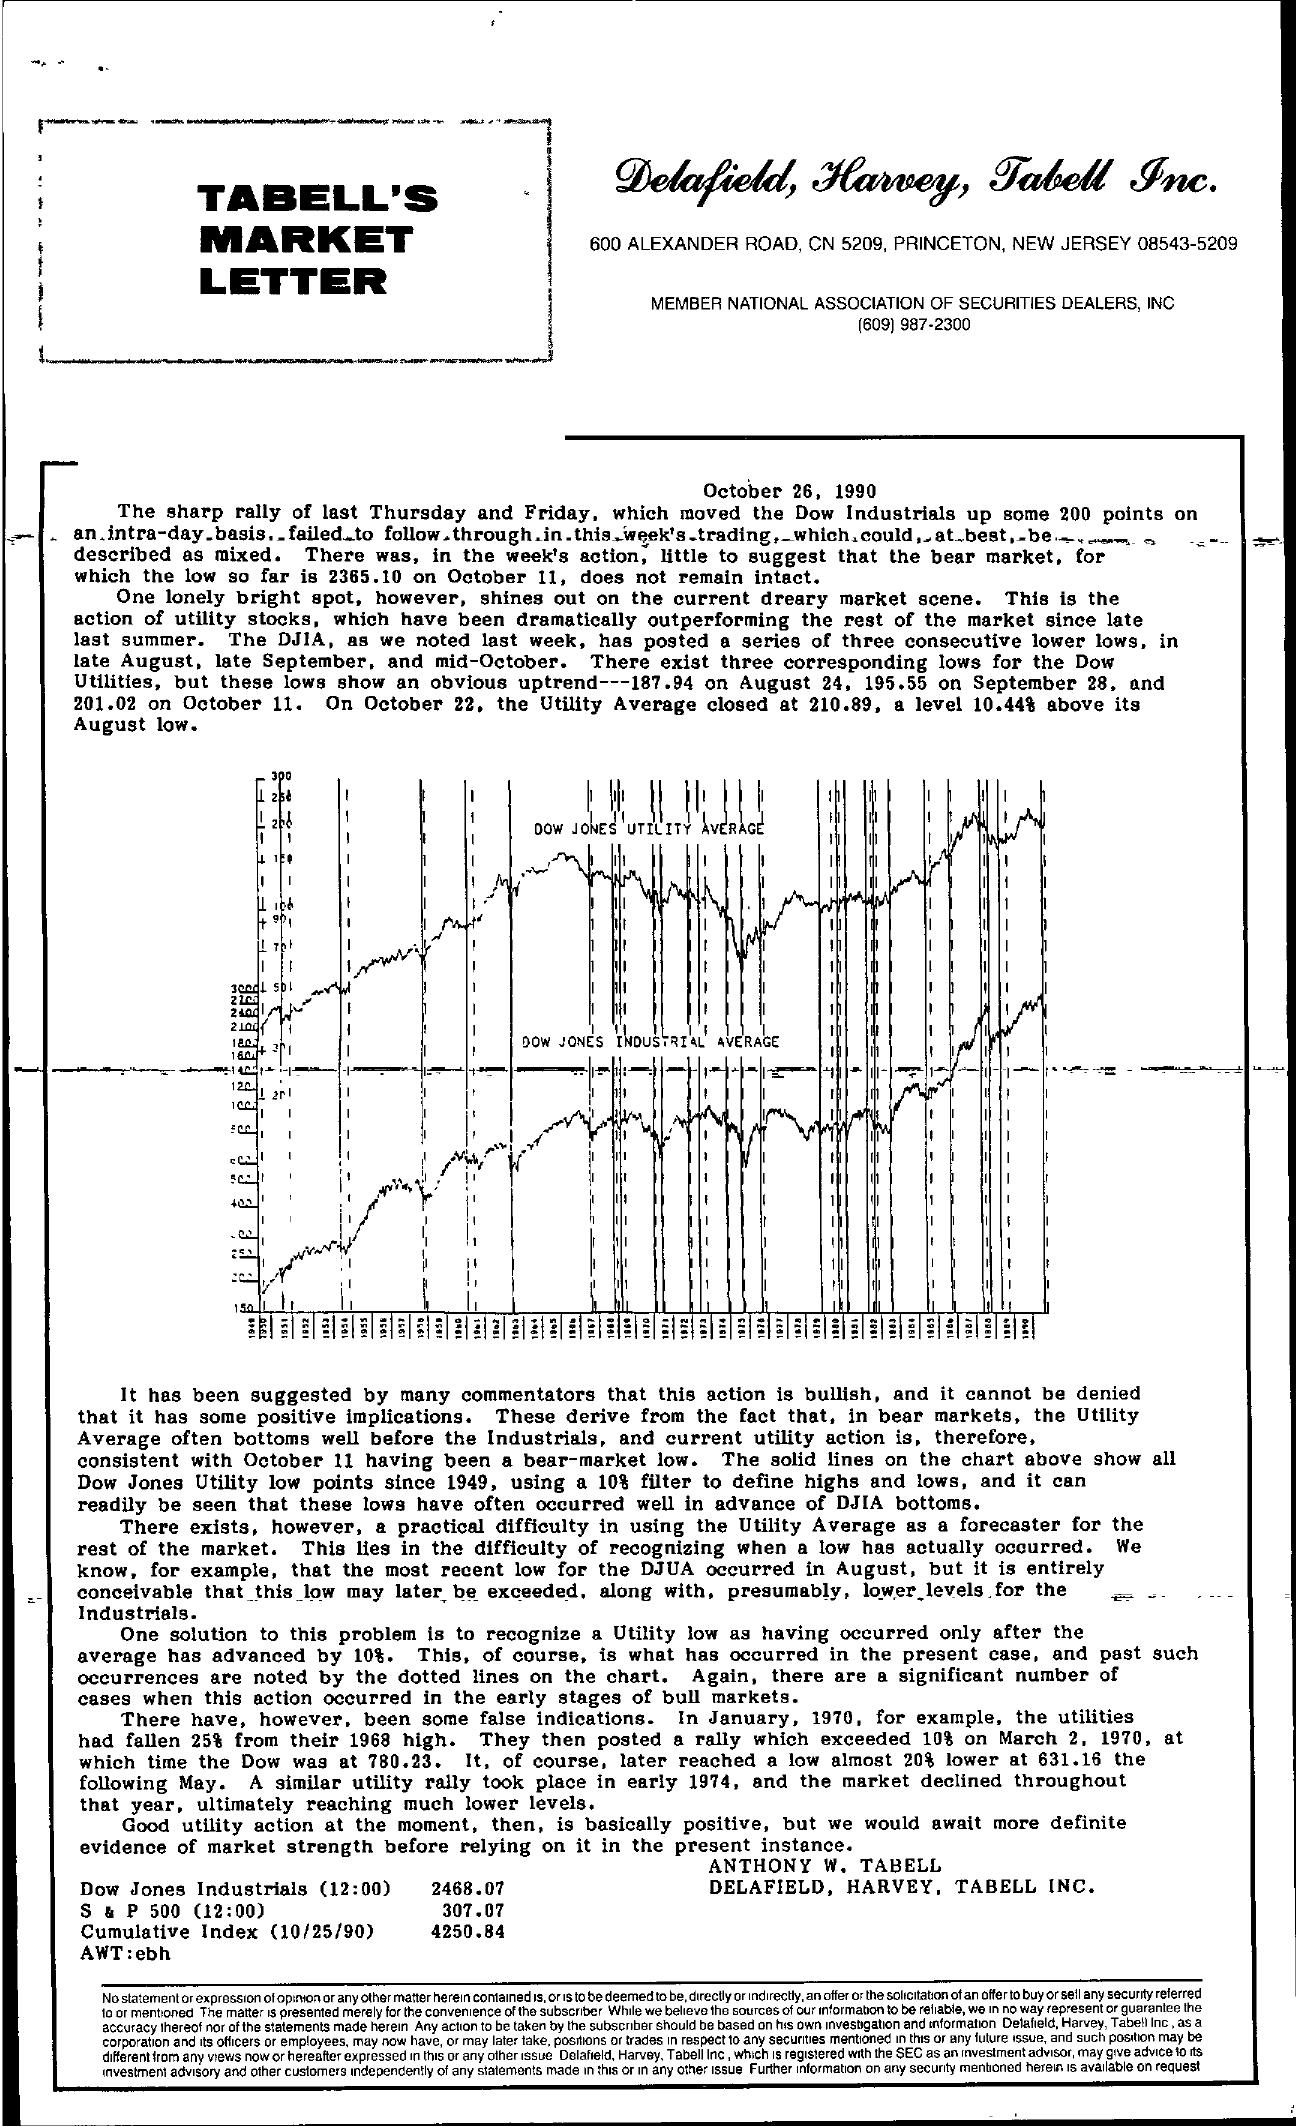 Tabell's Market Letter - October 26, 1990